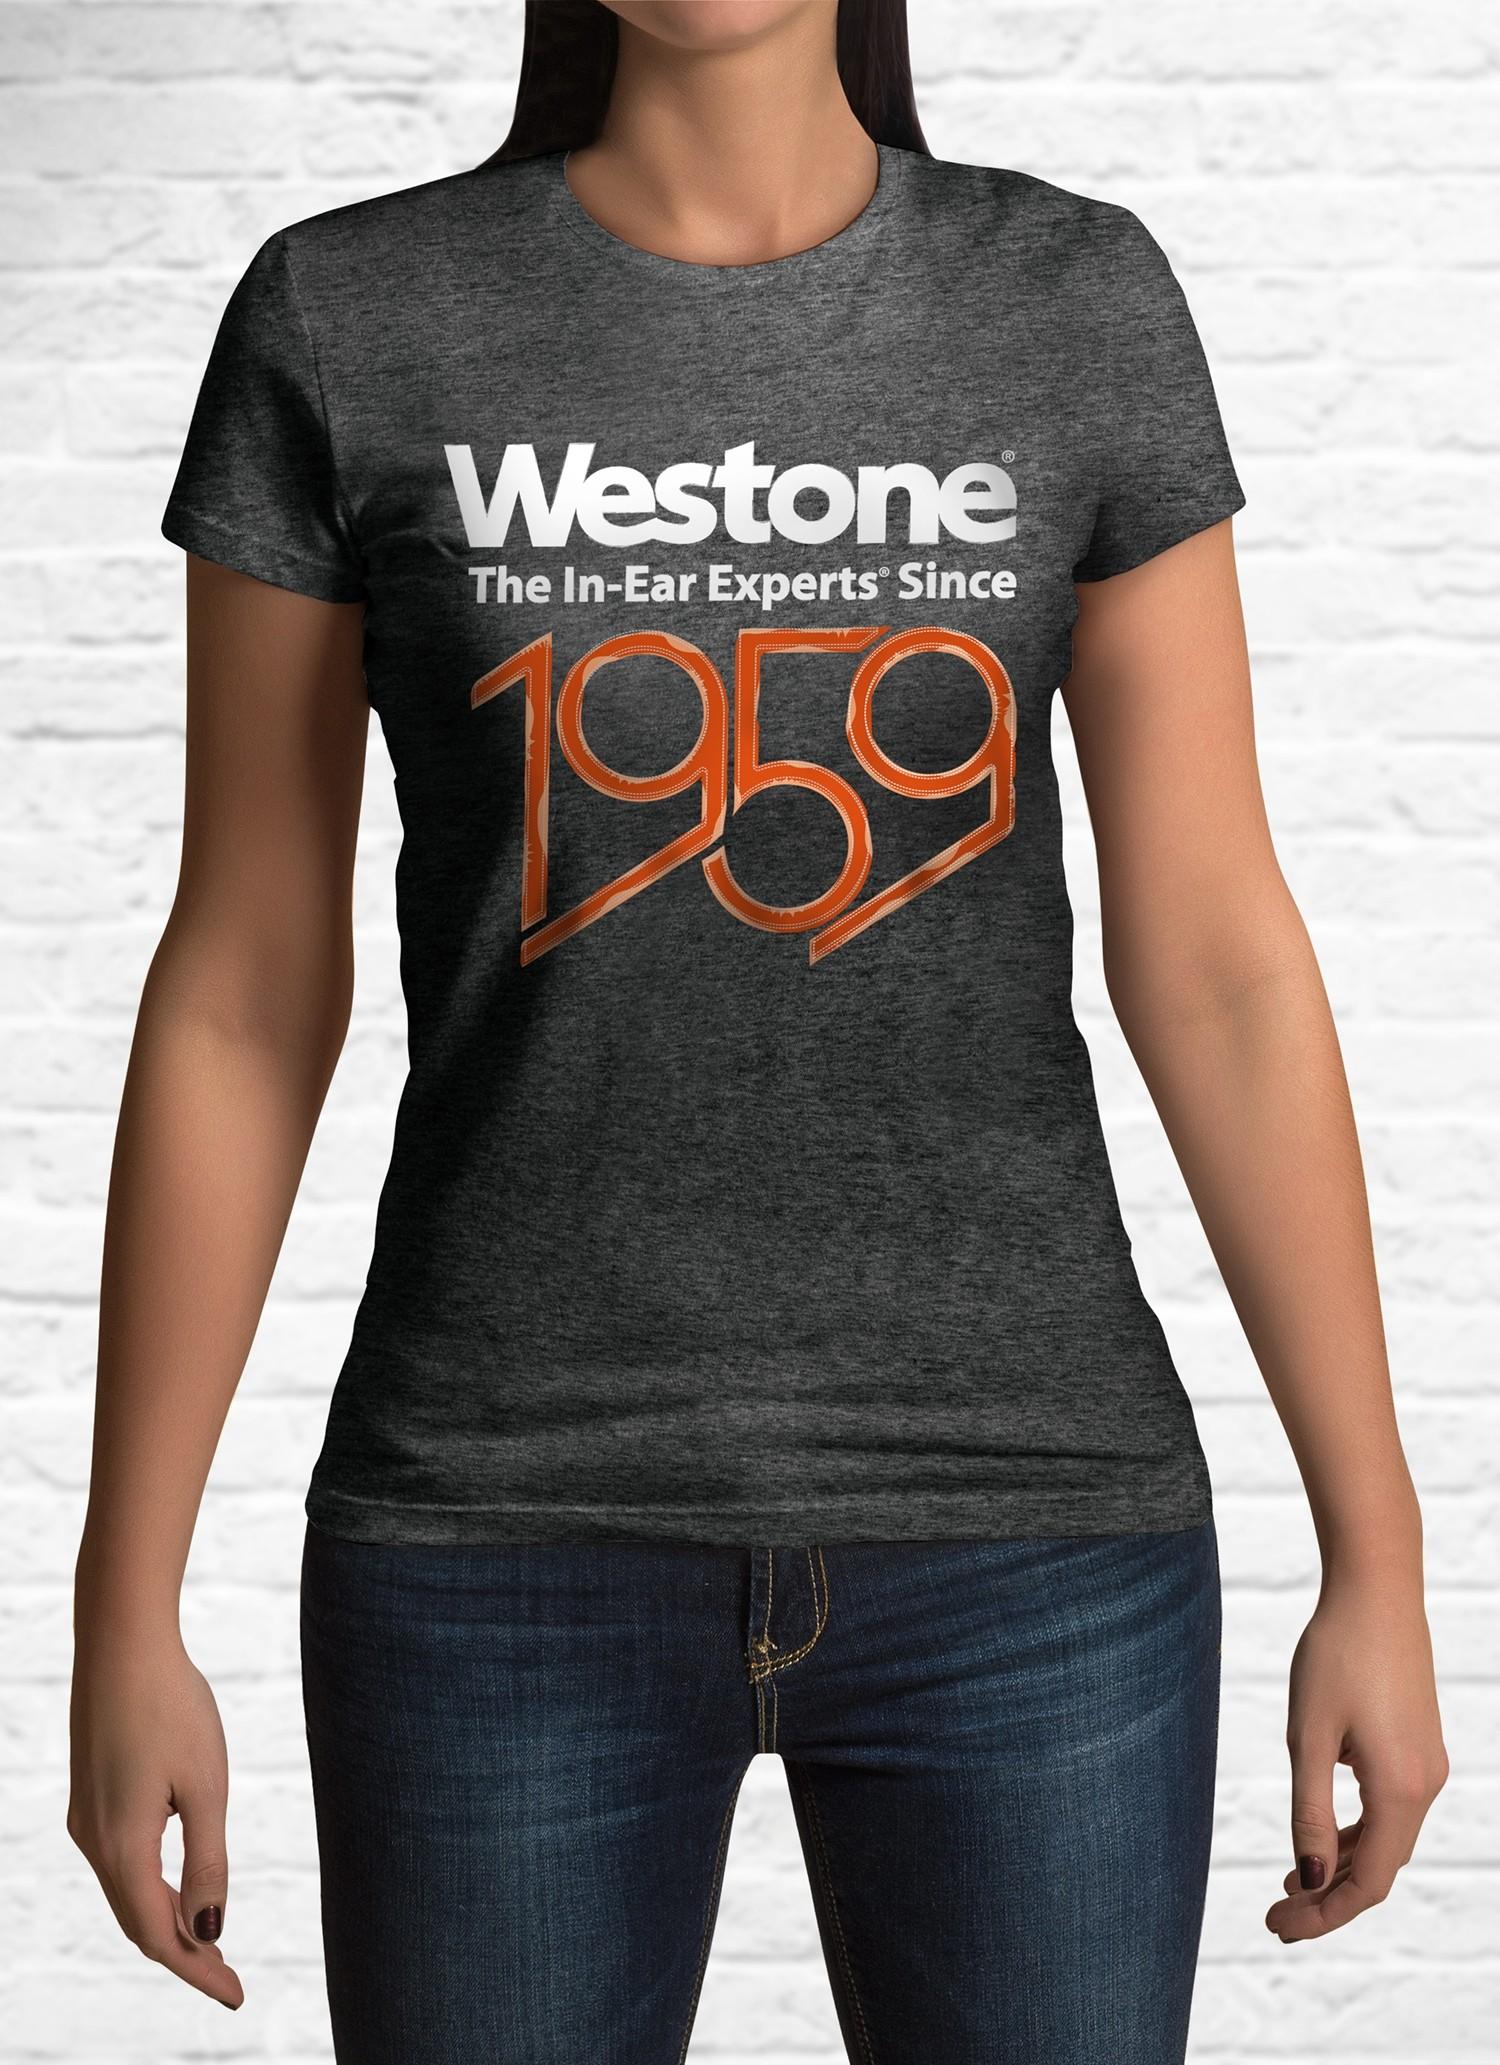 Westone Since 1959 T-Shirt Womens, Medium, Charcoal